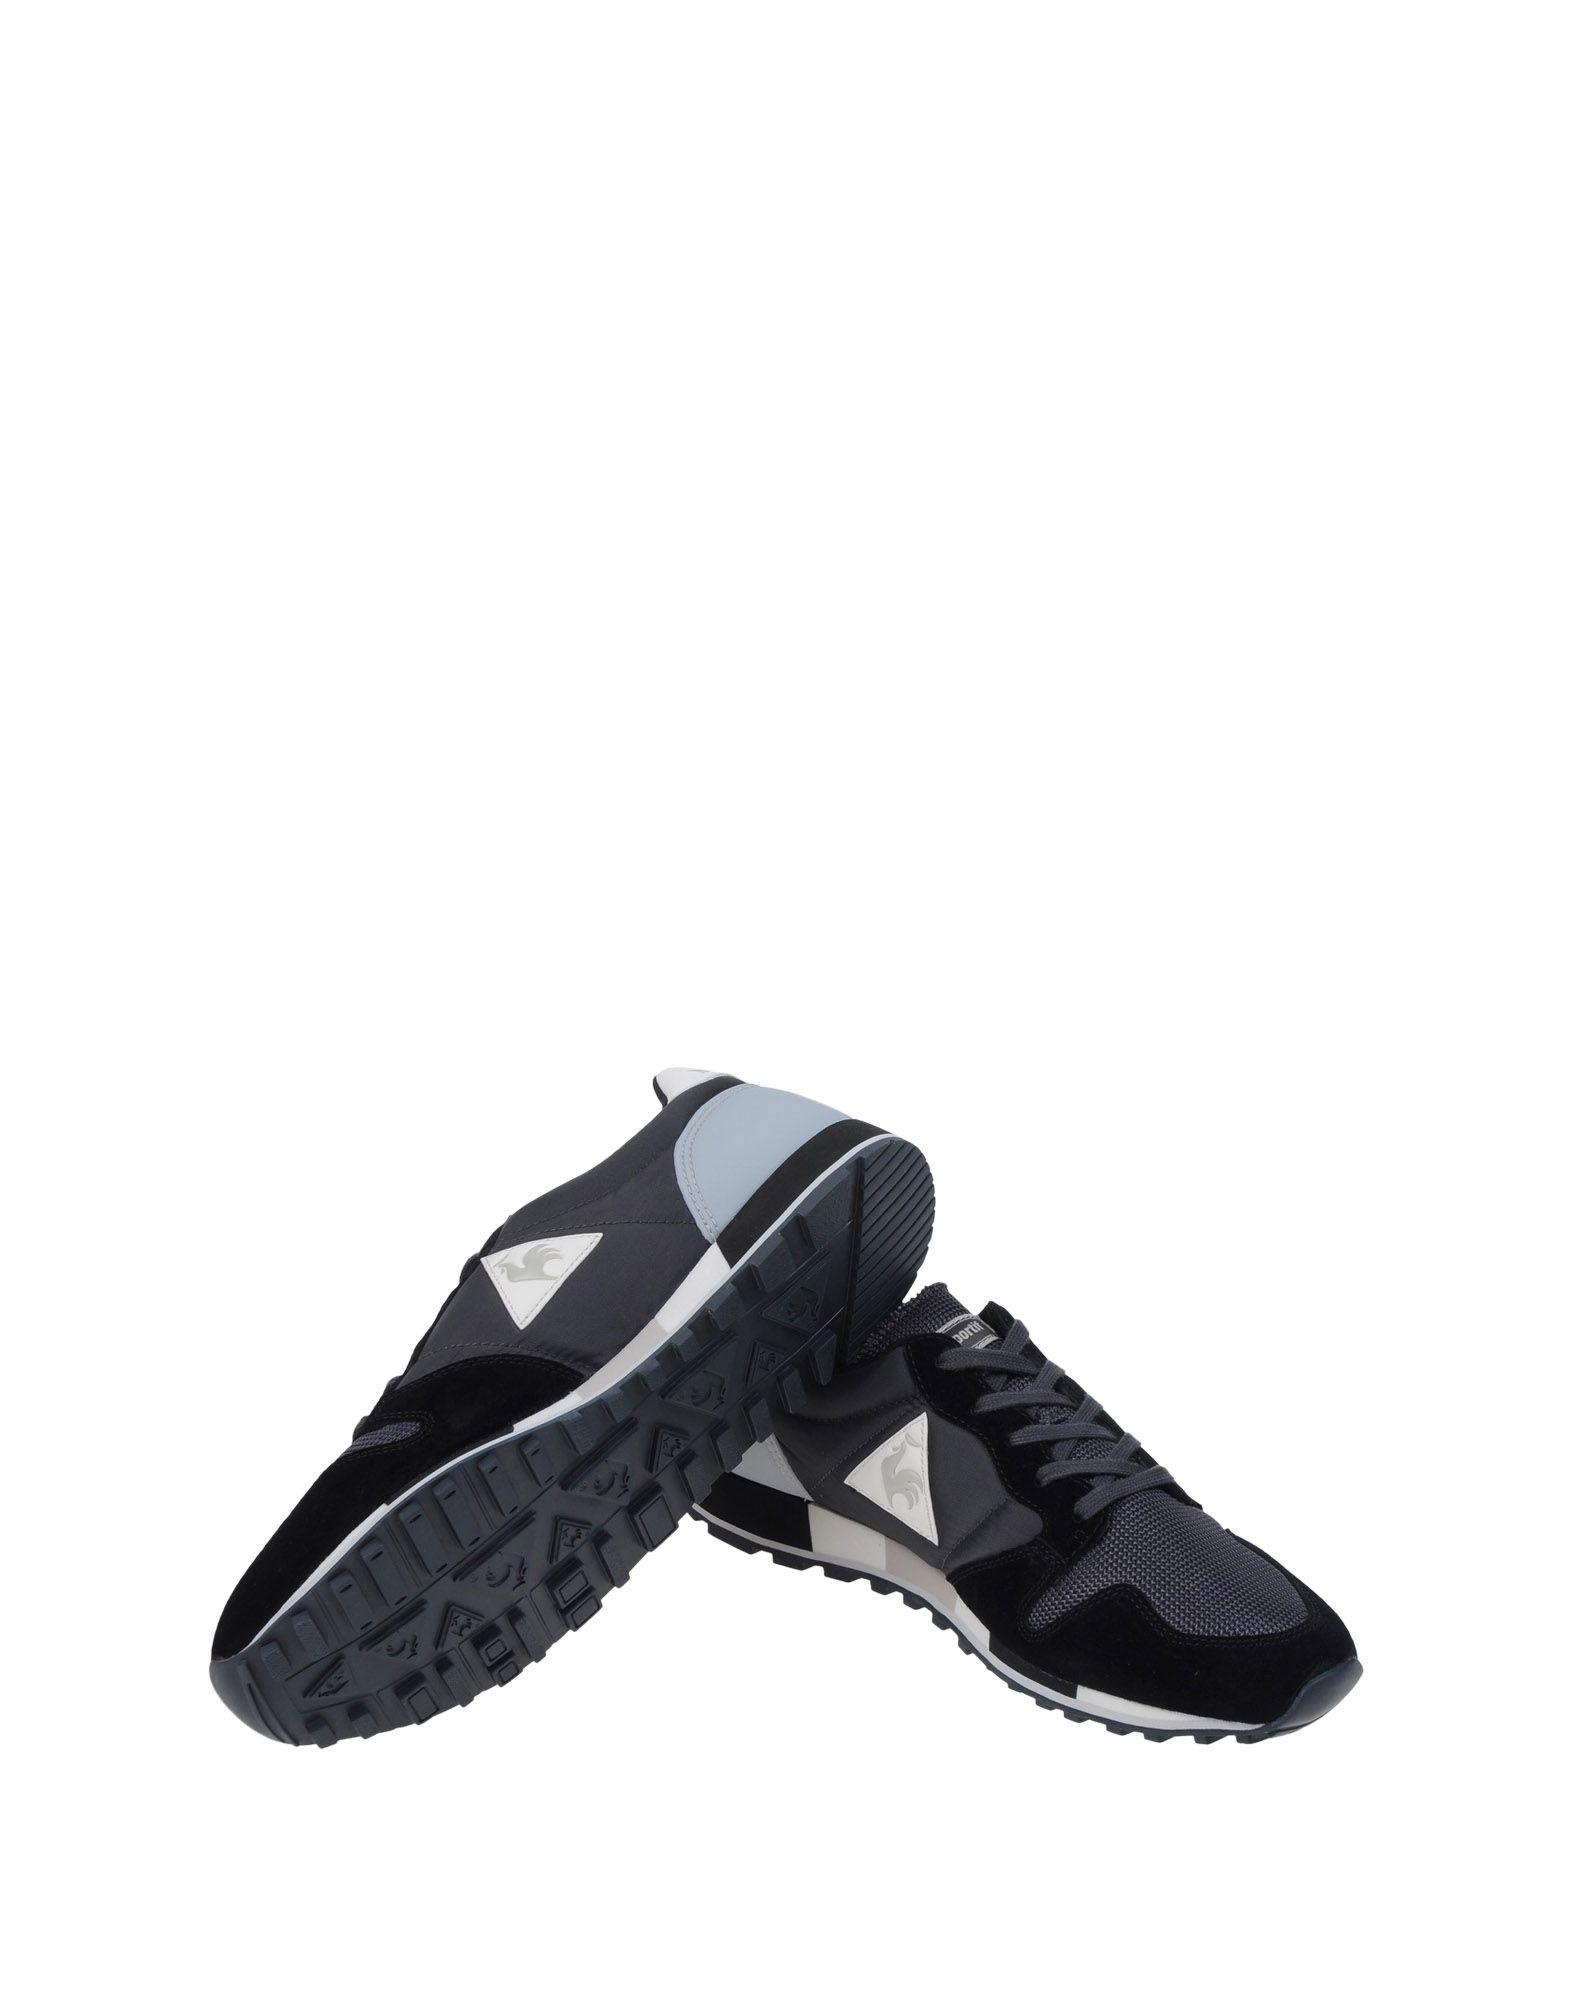 Sneakers Le Coq Sportif Omega Original - Homme - Sneakers Le Coq Sportif sur